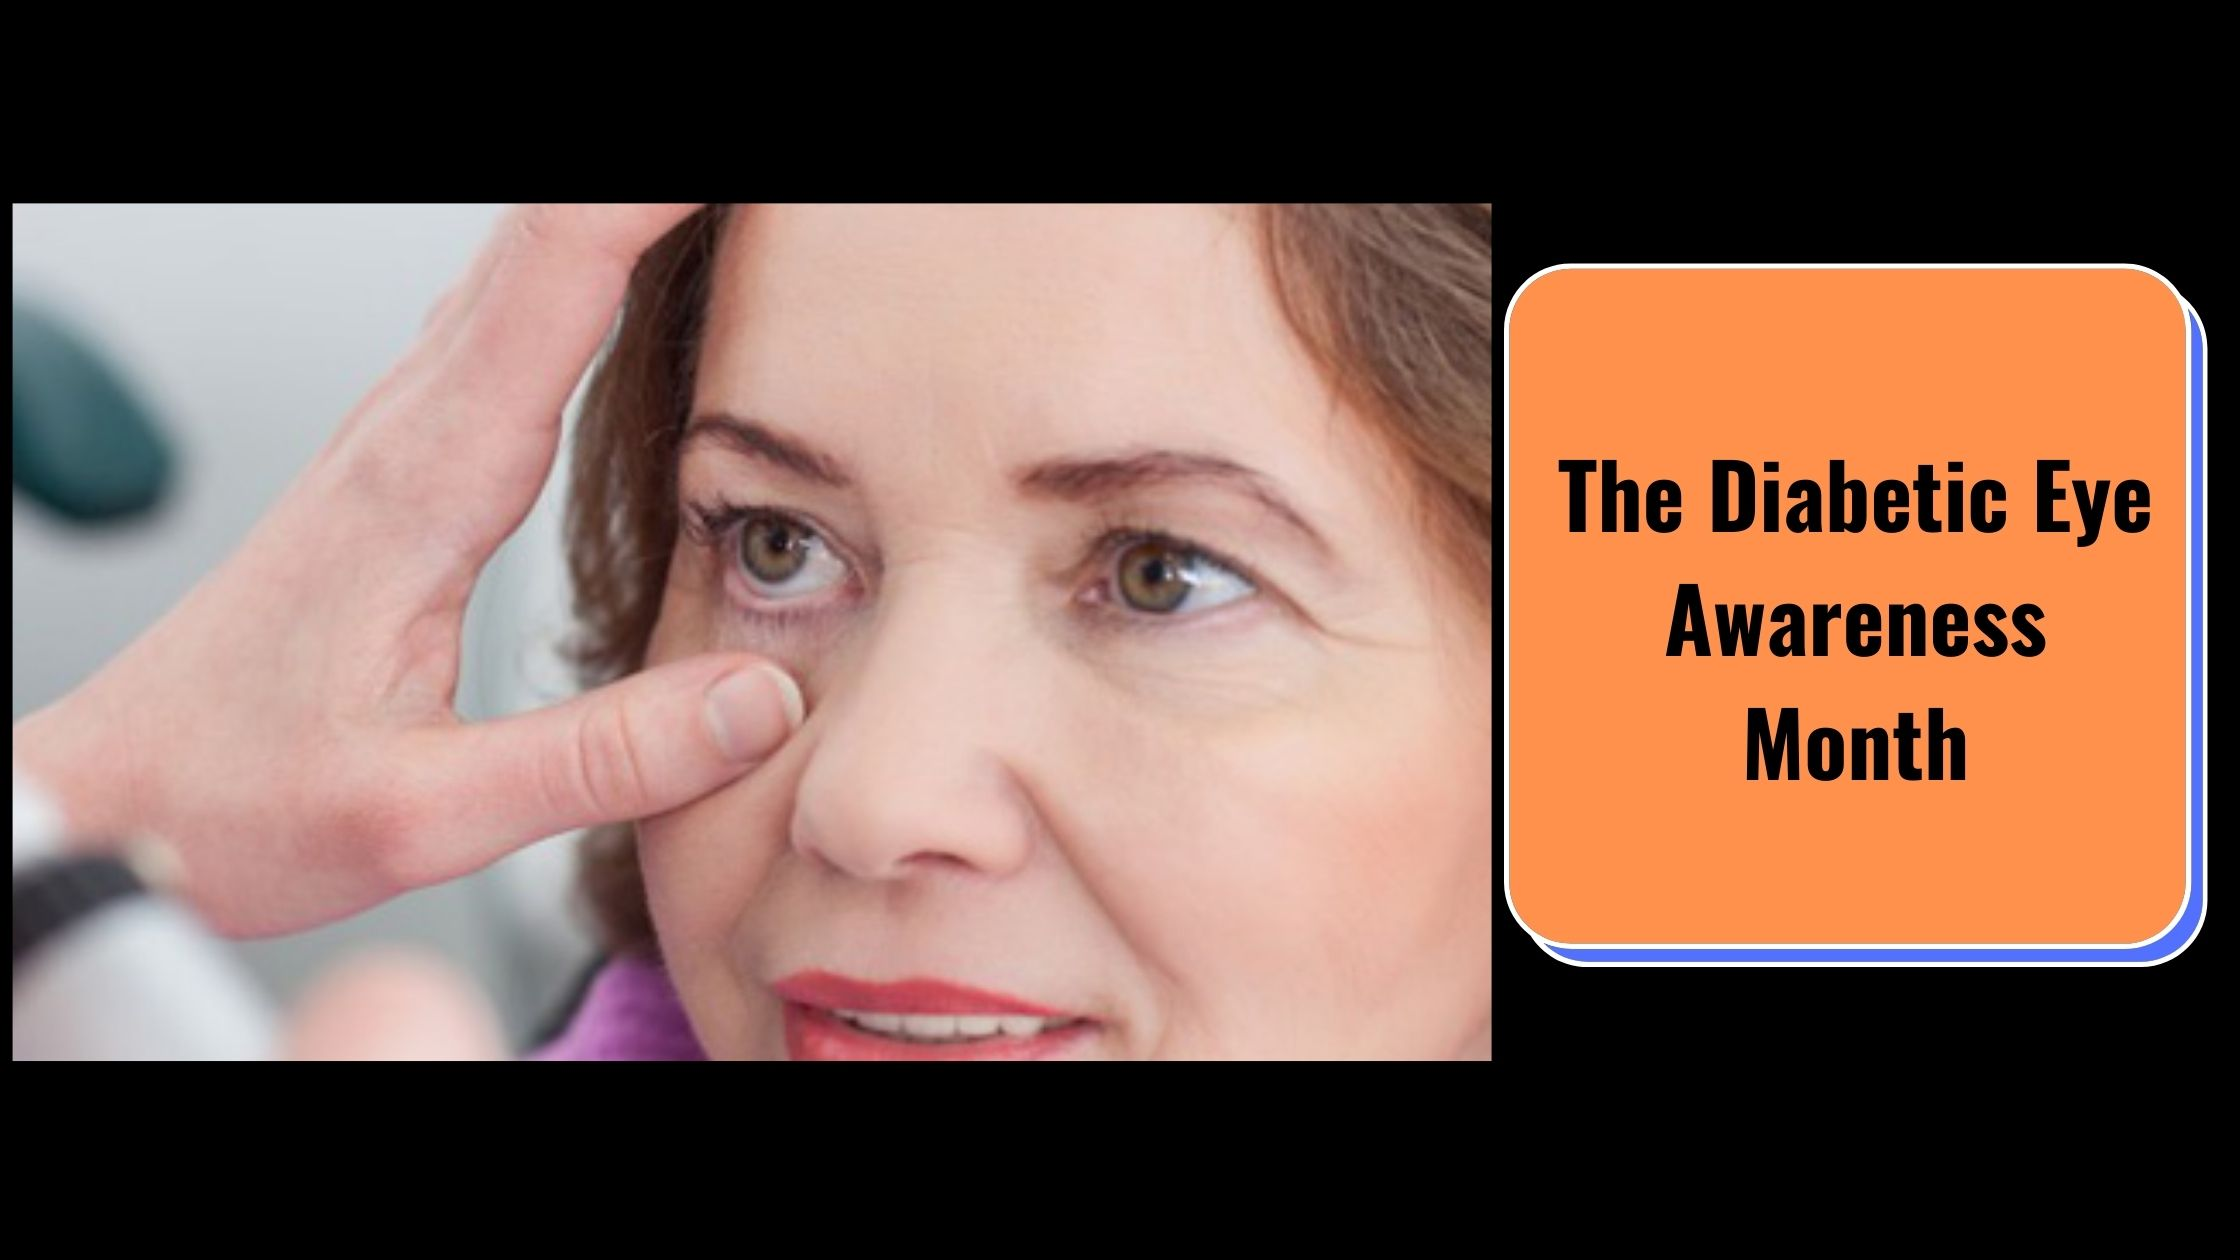 The Diabetic Eye Awareness Month